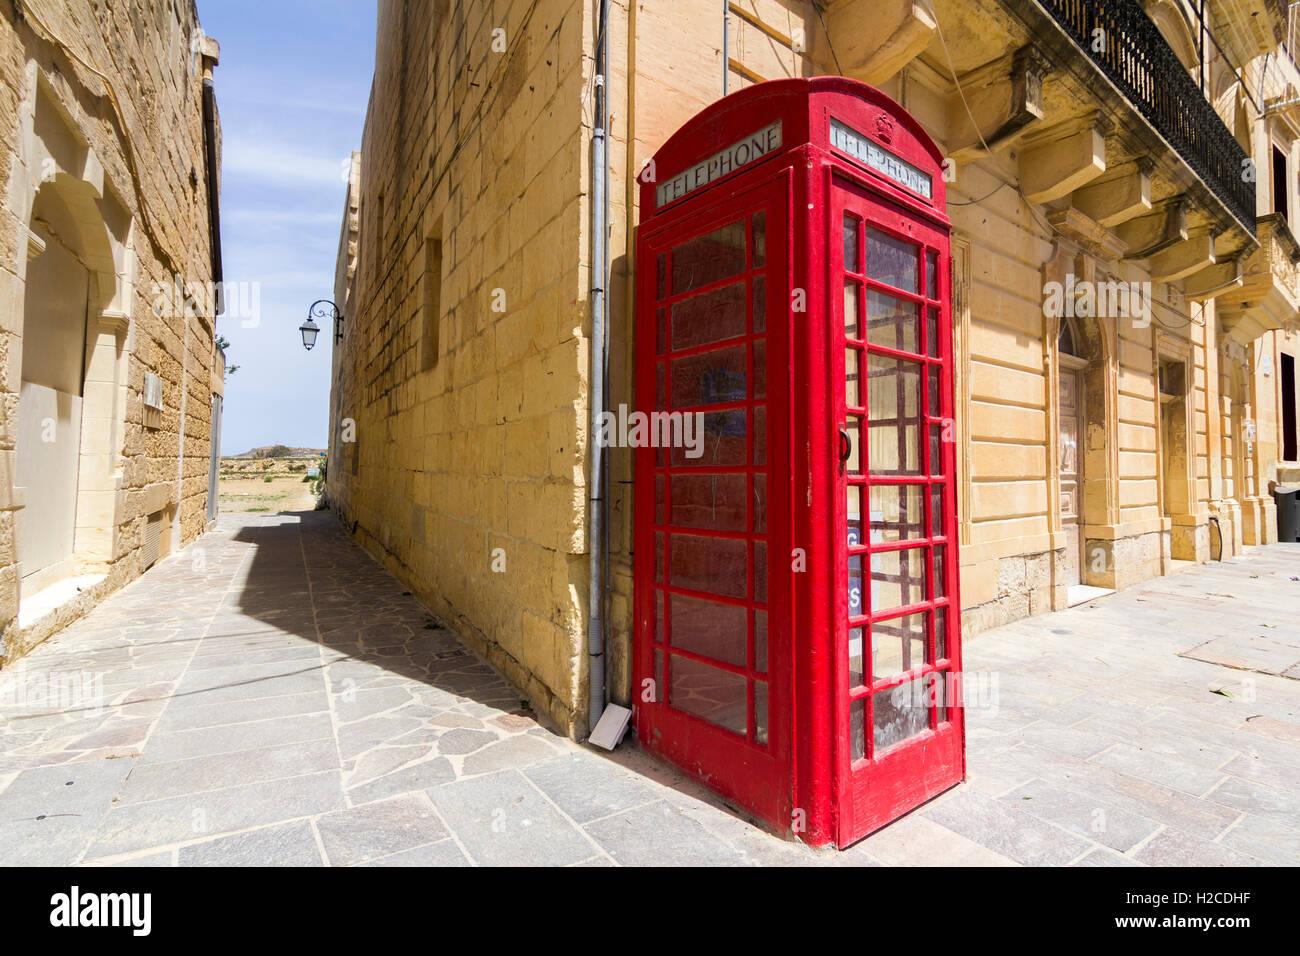 Red telephone box unusual location in Malta sunny weather - Stock Image